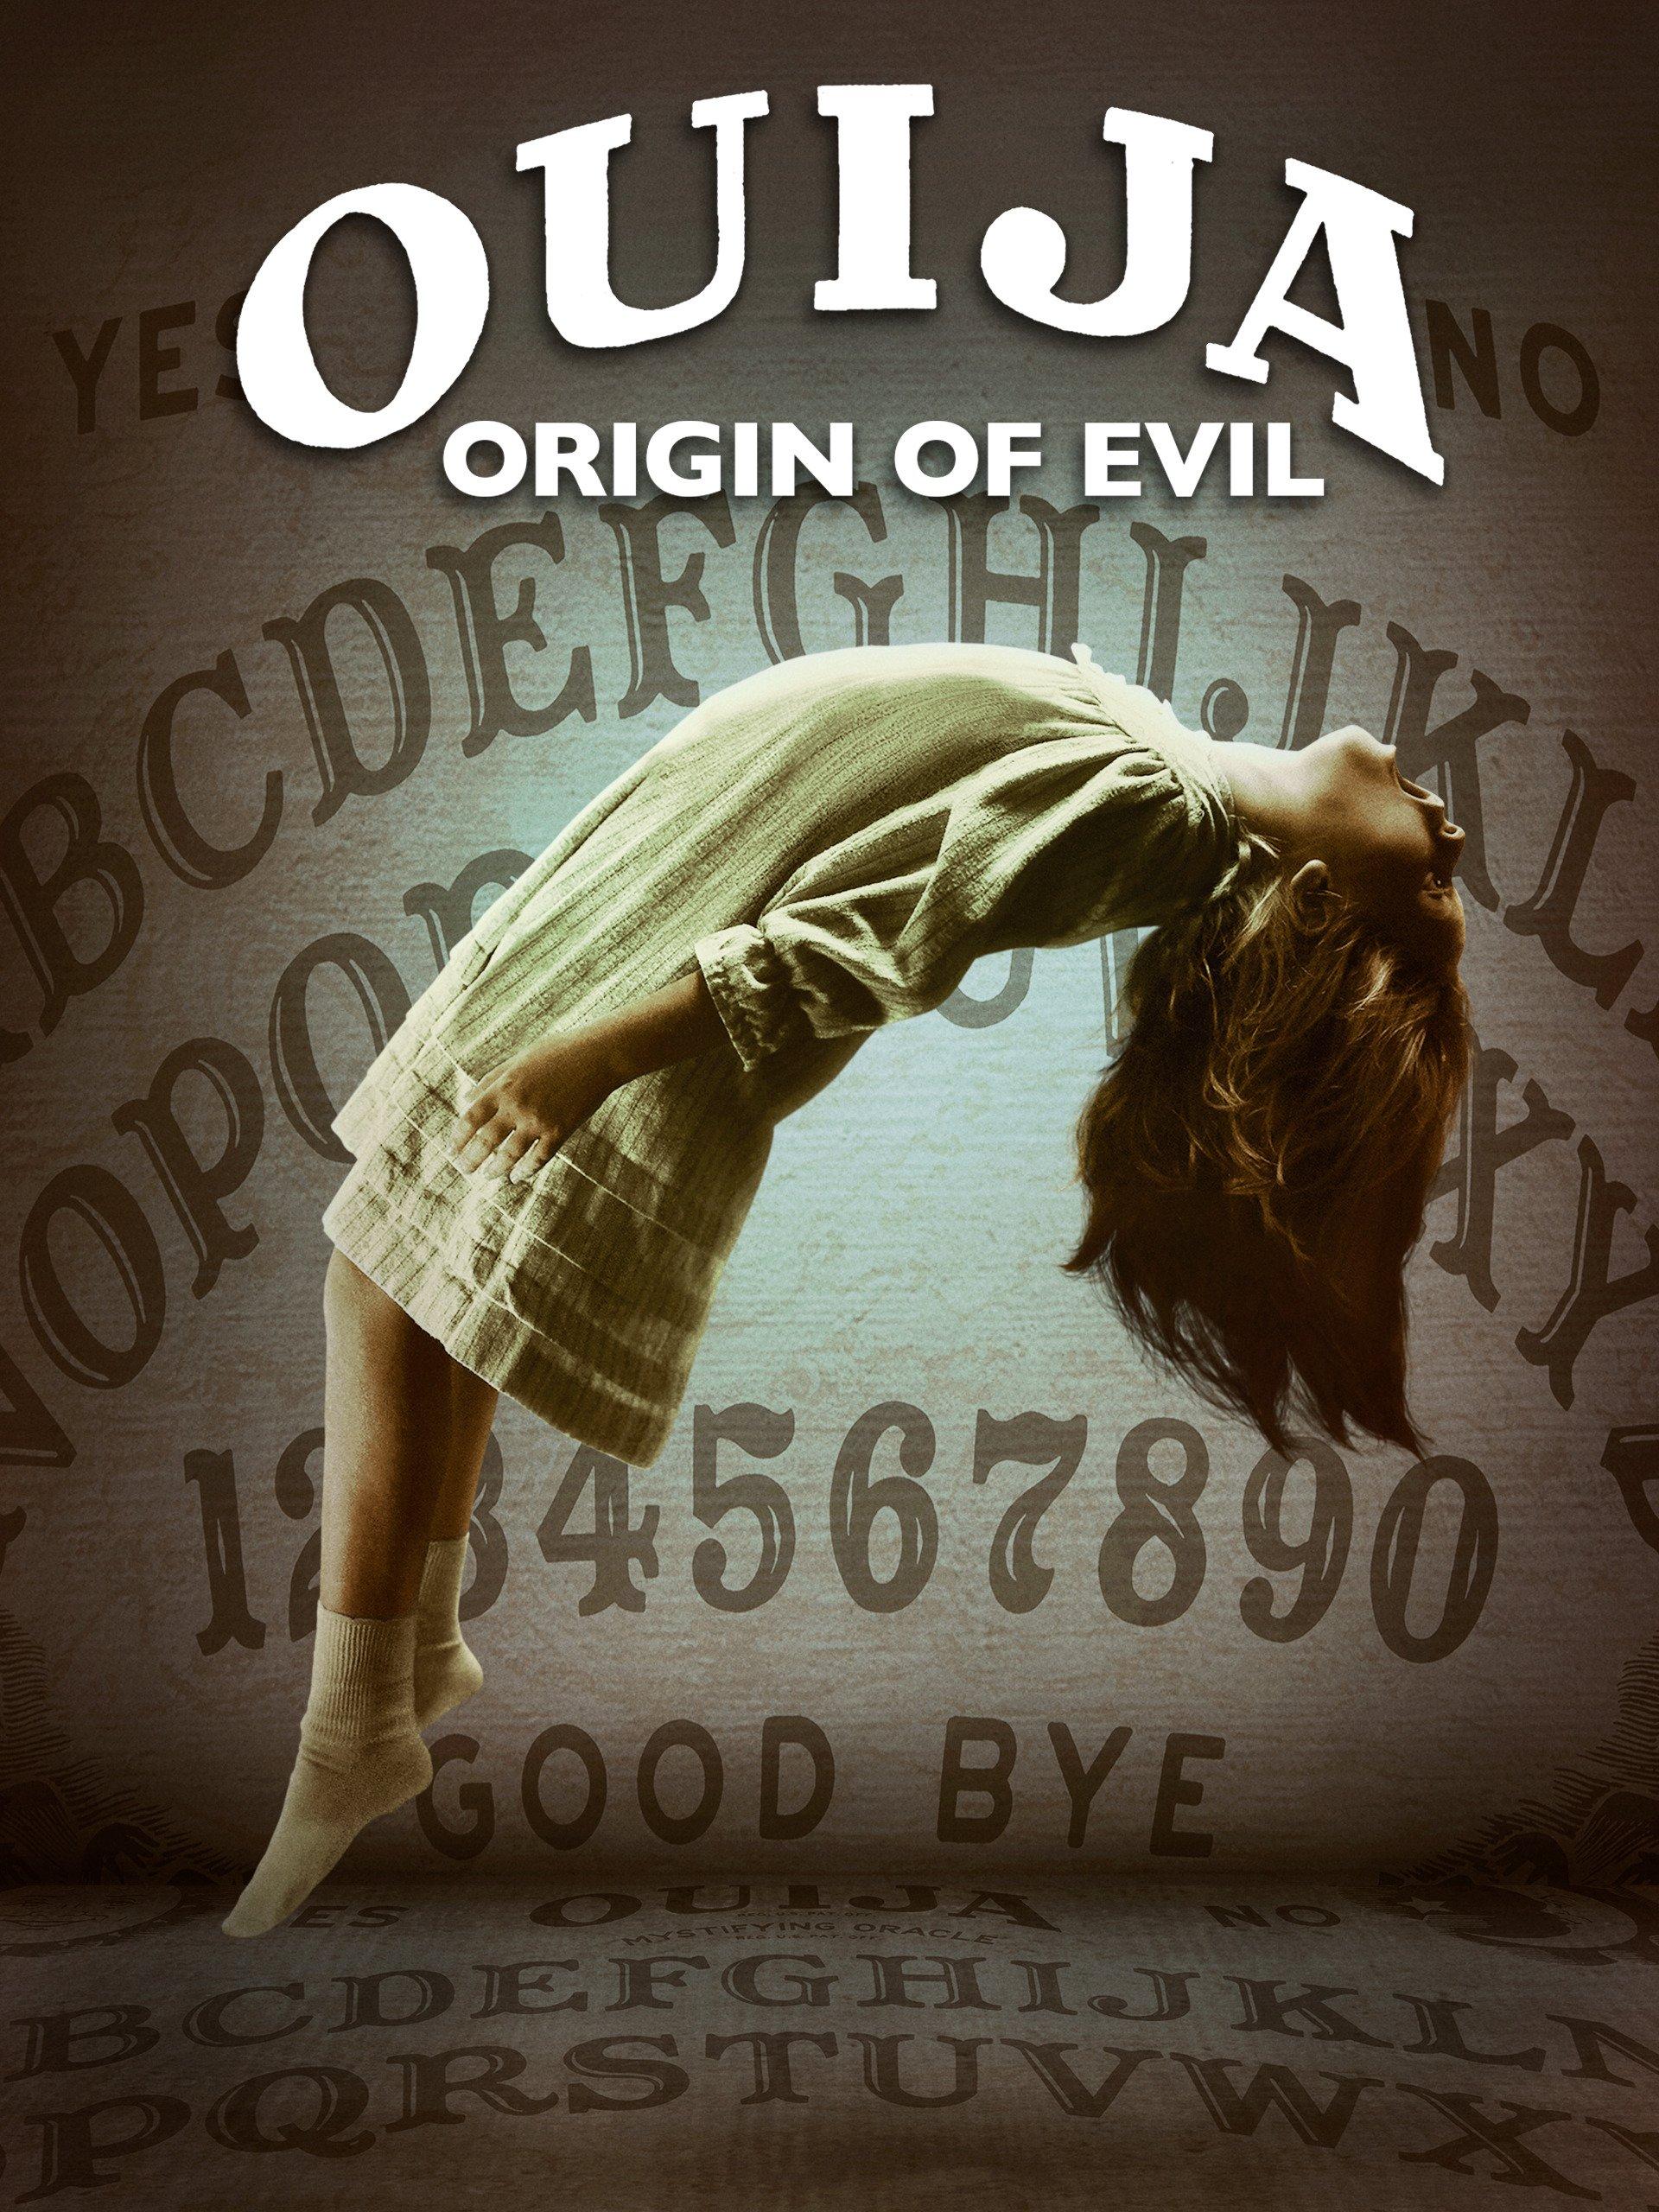 Watch Ouija Origin of Evil Prime Video 1920x2560